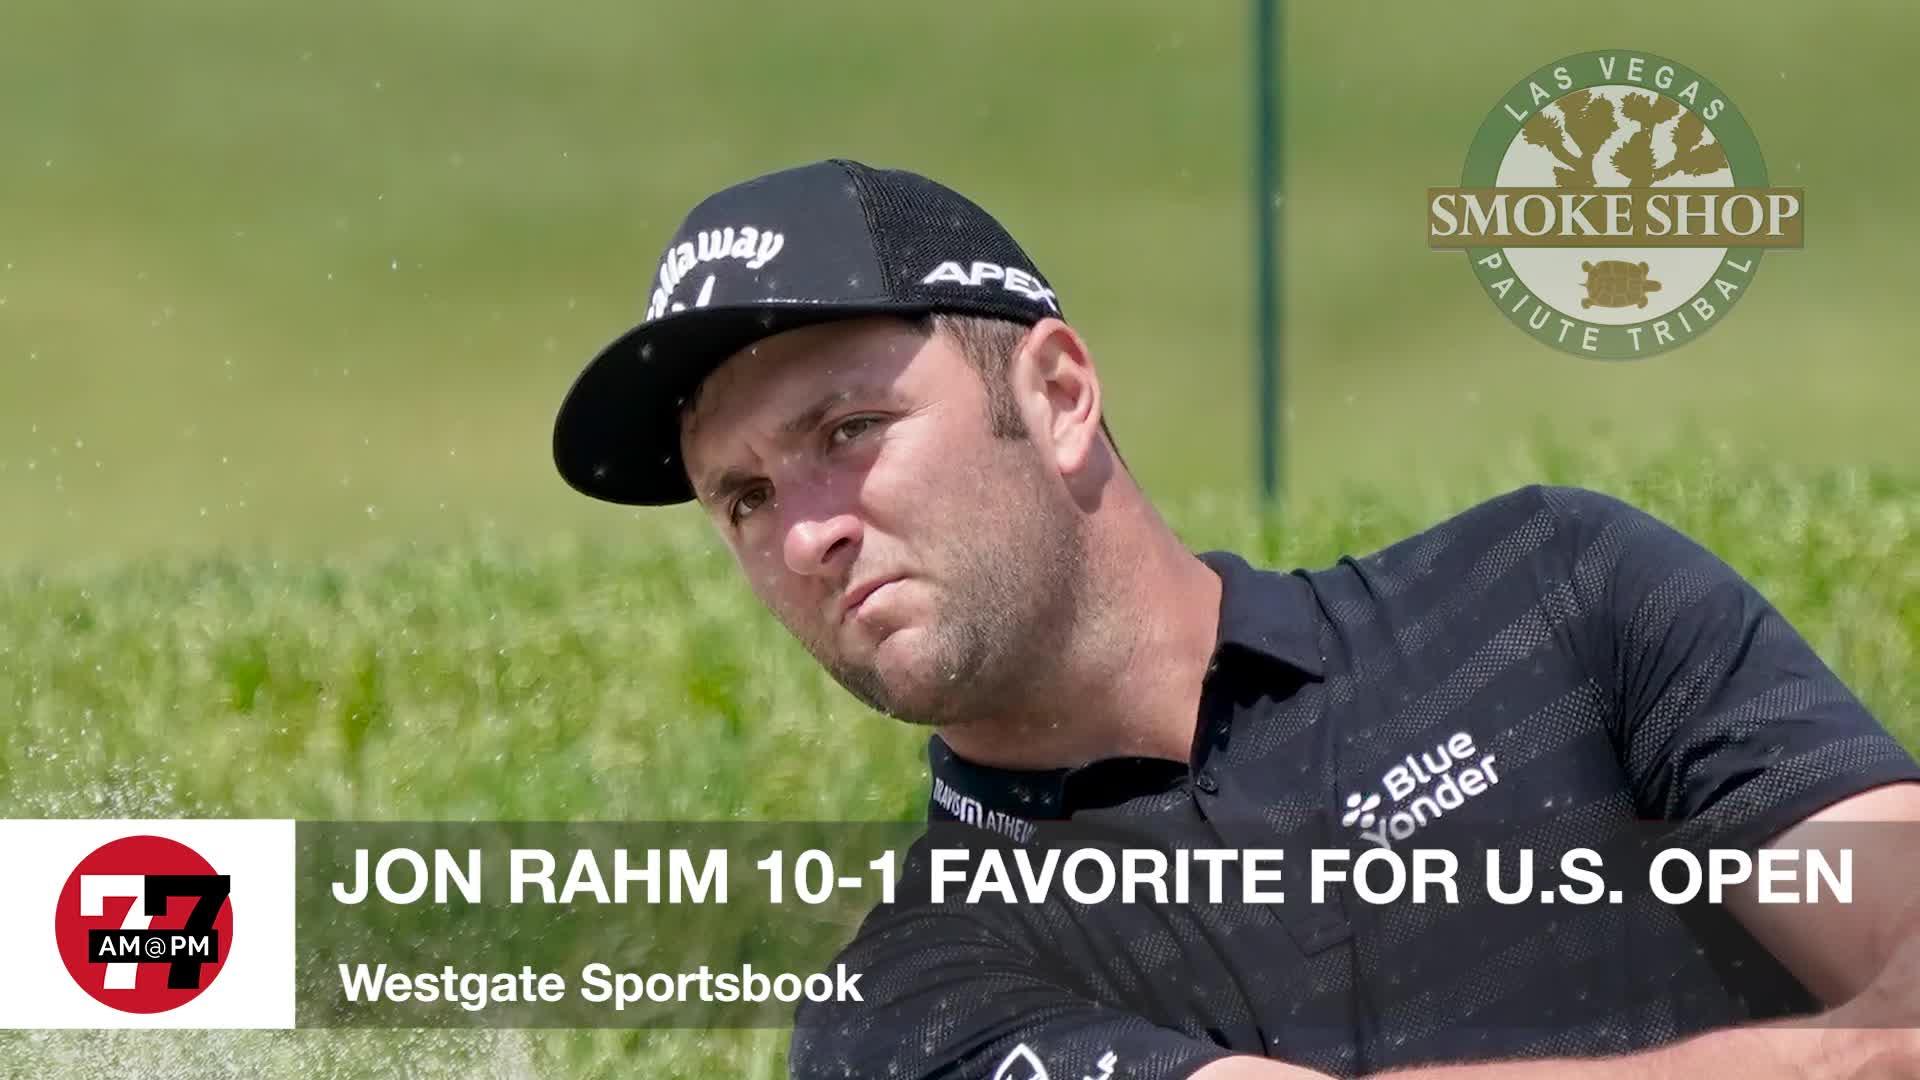 7@7PM Jon Rahm Favored in U.S. Open